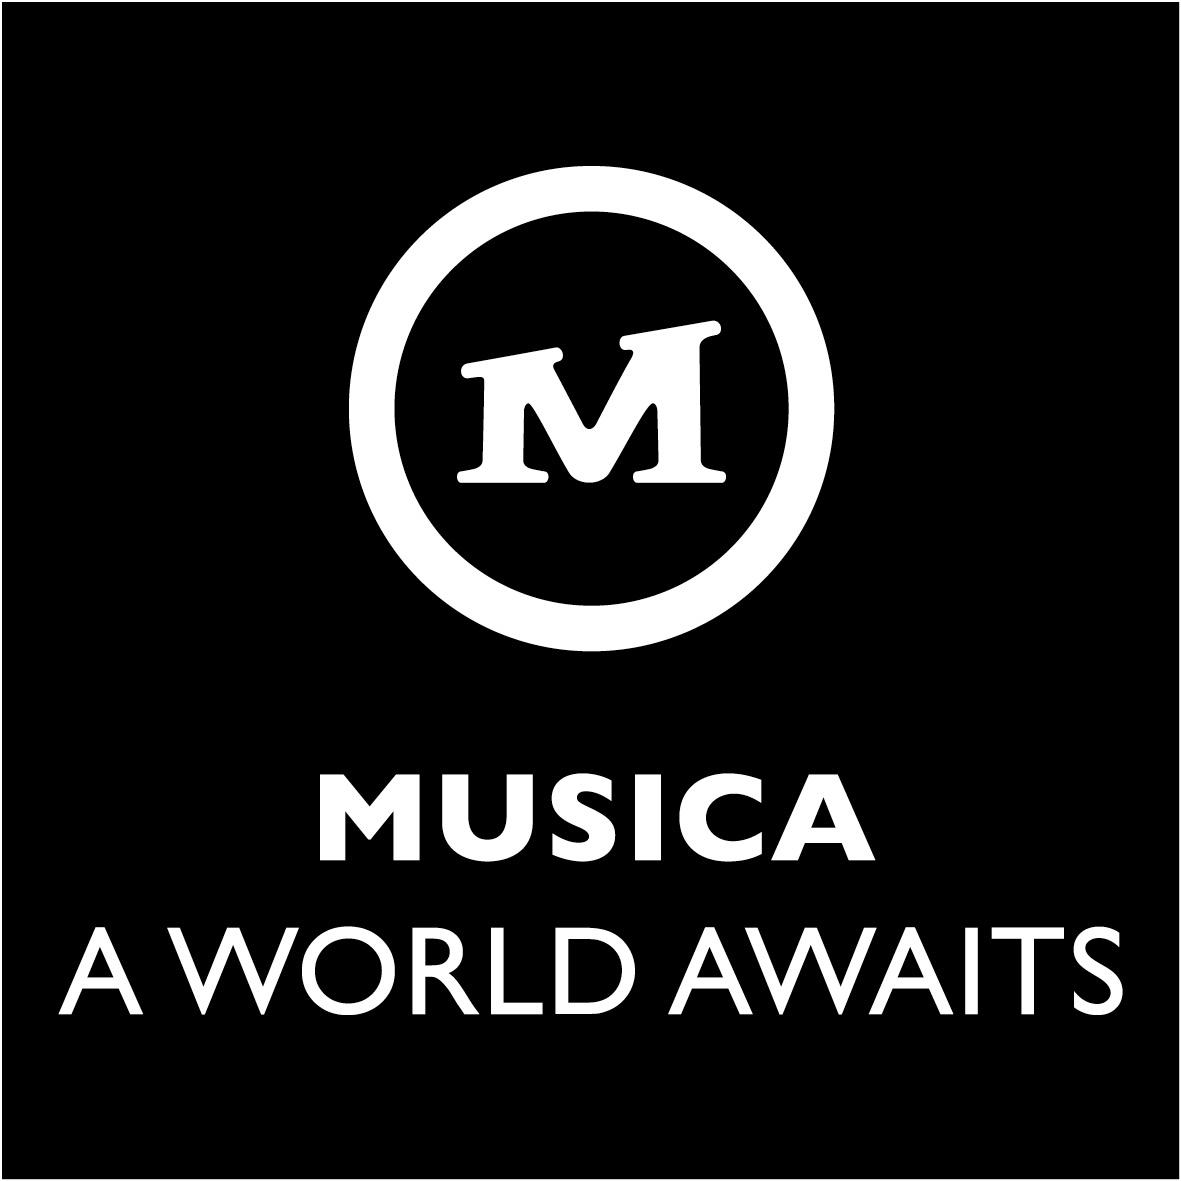 Musica logo_10x10_300dpi « Training Fundamentals